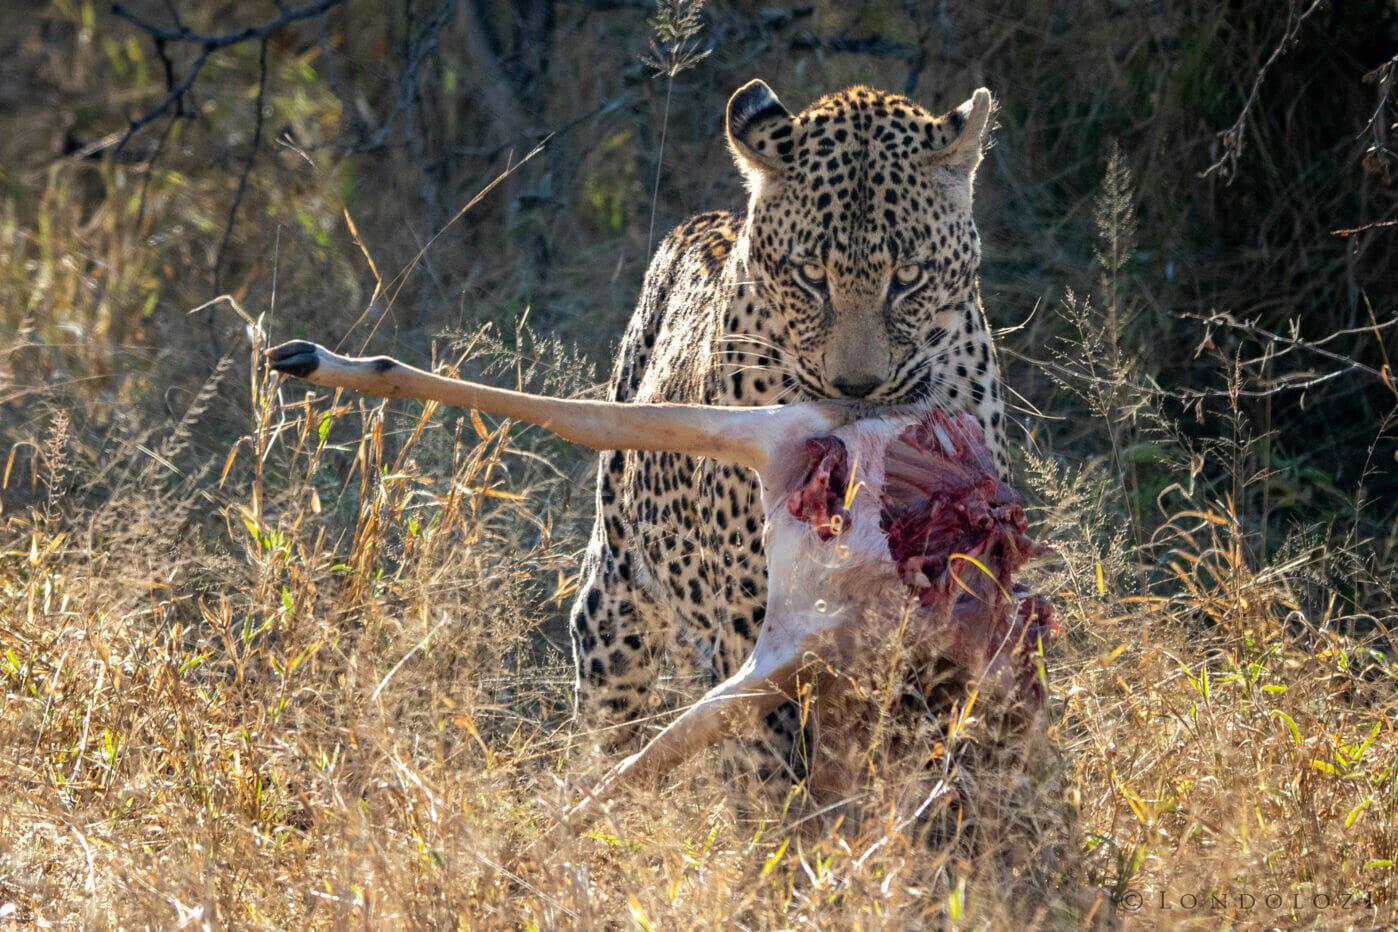 CT Nweti Male Leopard Dragging Kill June 2021